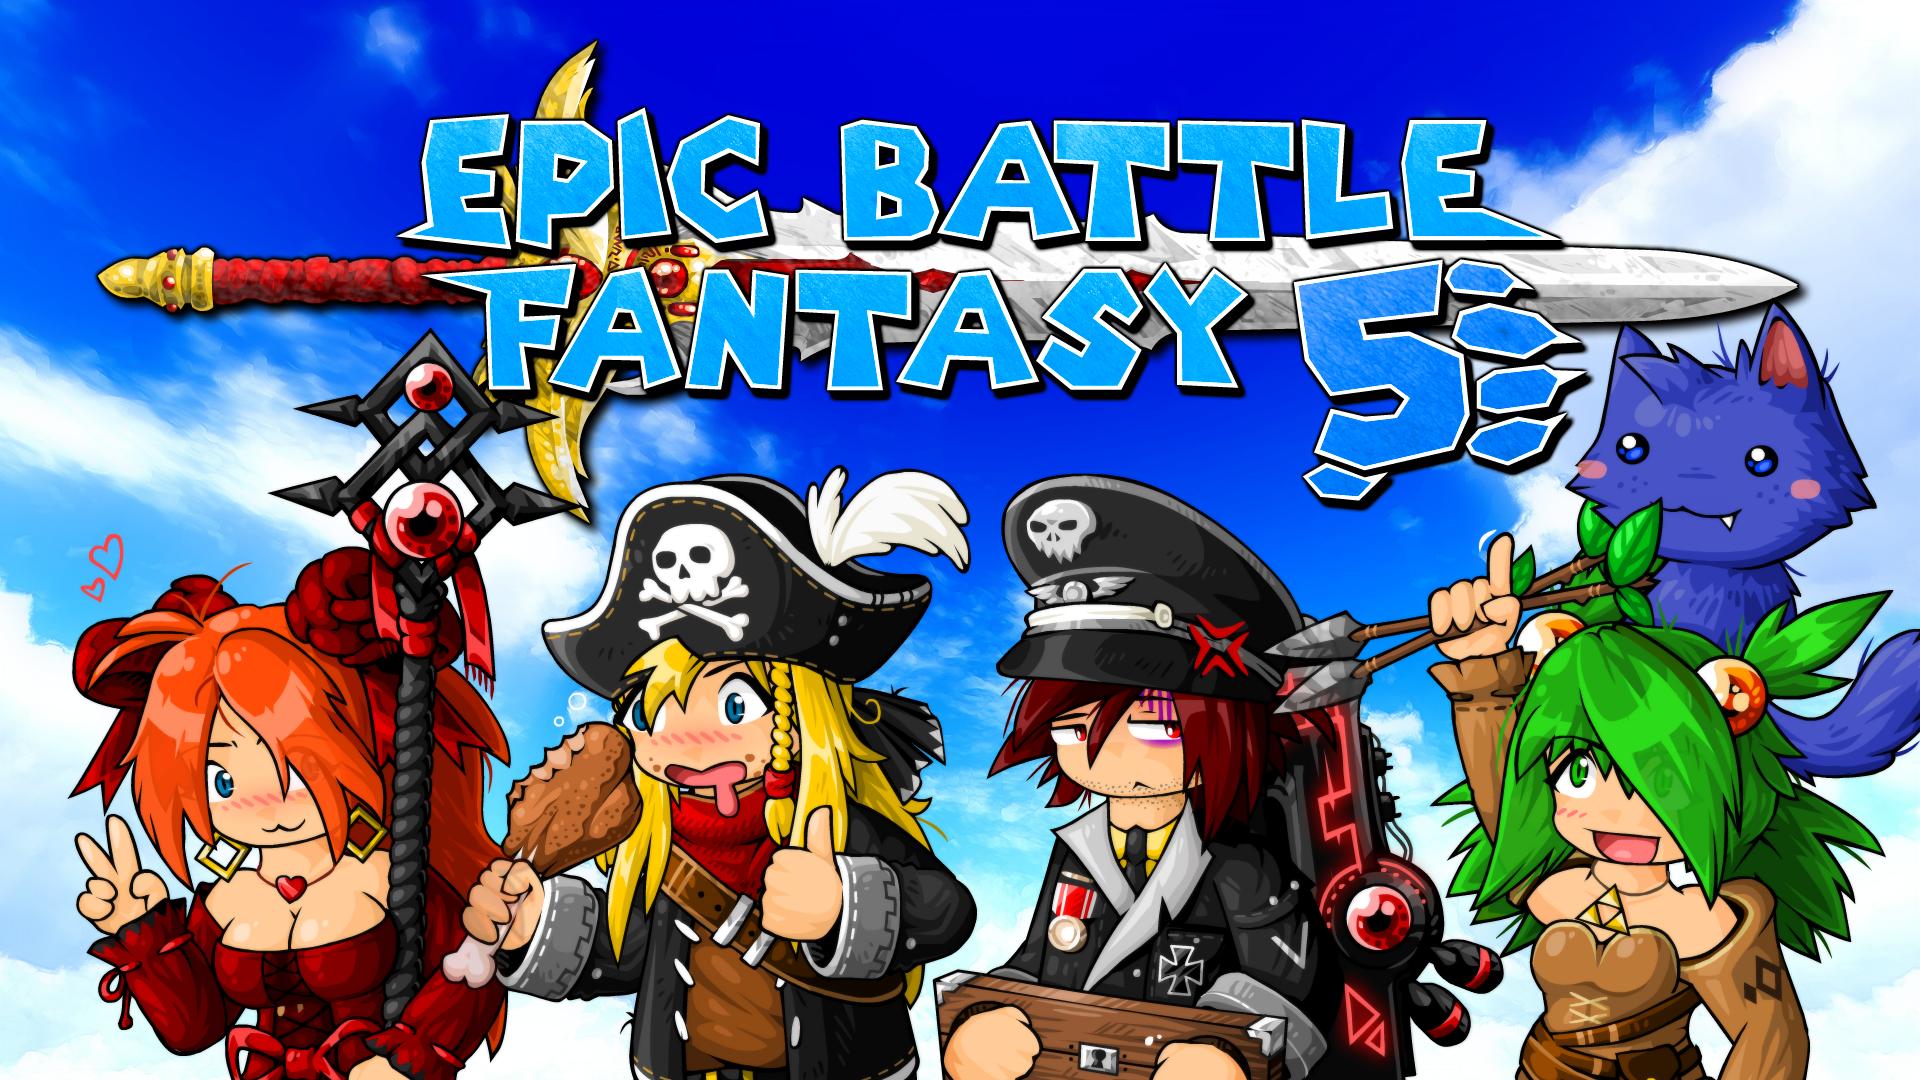 Epic Battle Fantasy 5 | Epic Battle Fantasy Wiki | FANDOM